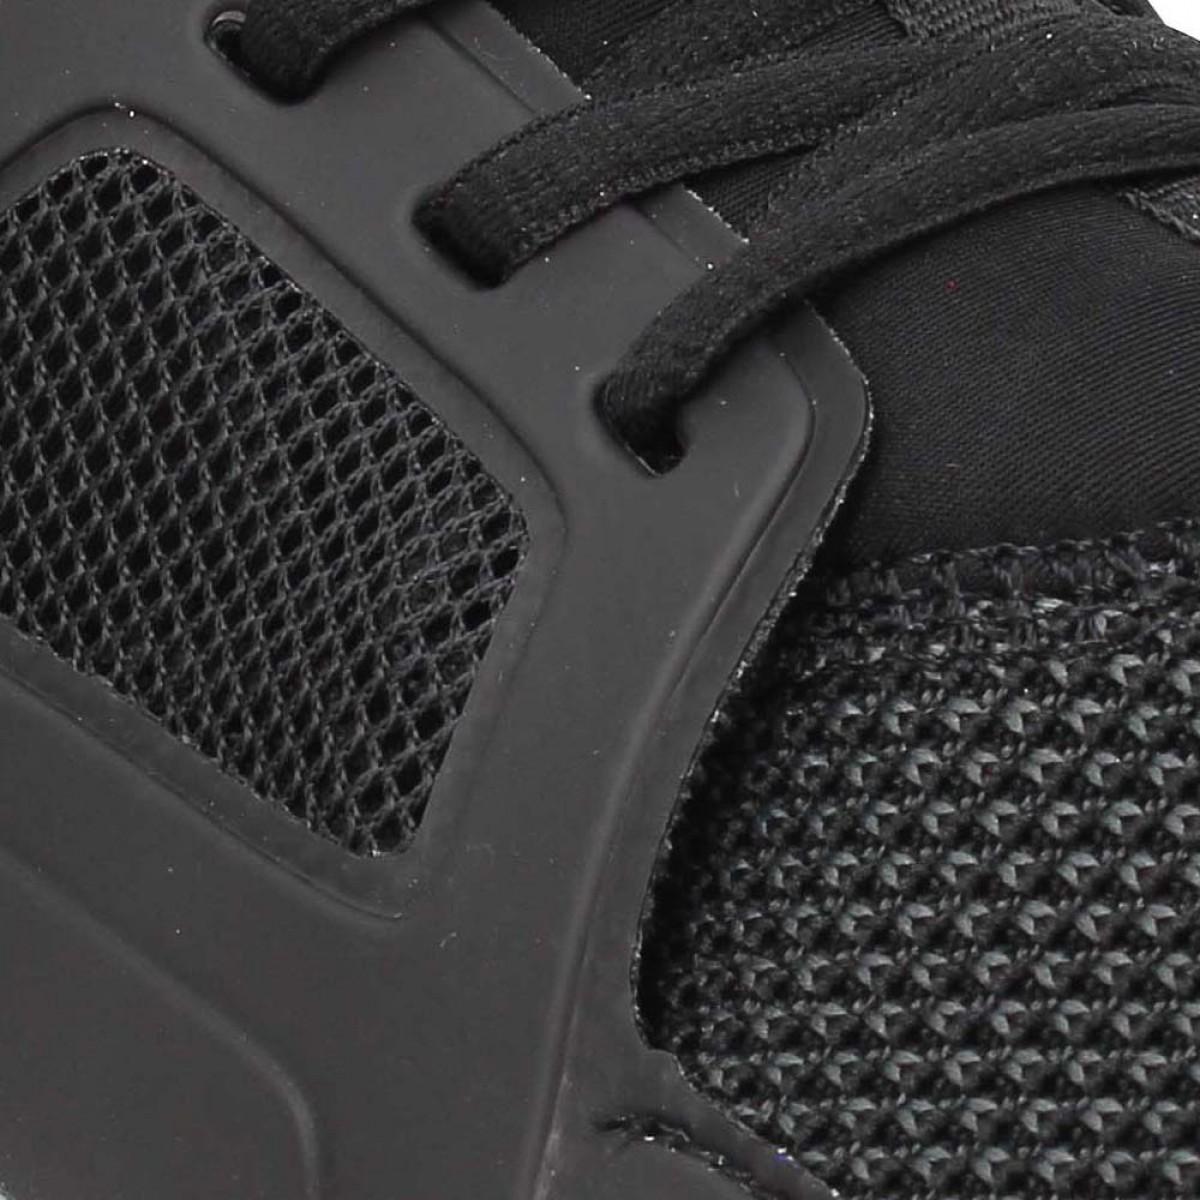 b88295aad5f606 Chaussures Polo ralph lauren train 150 toile homme noir homme ...